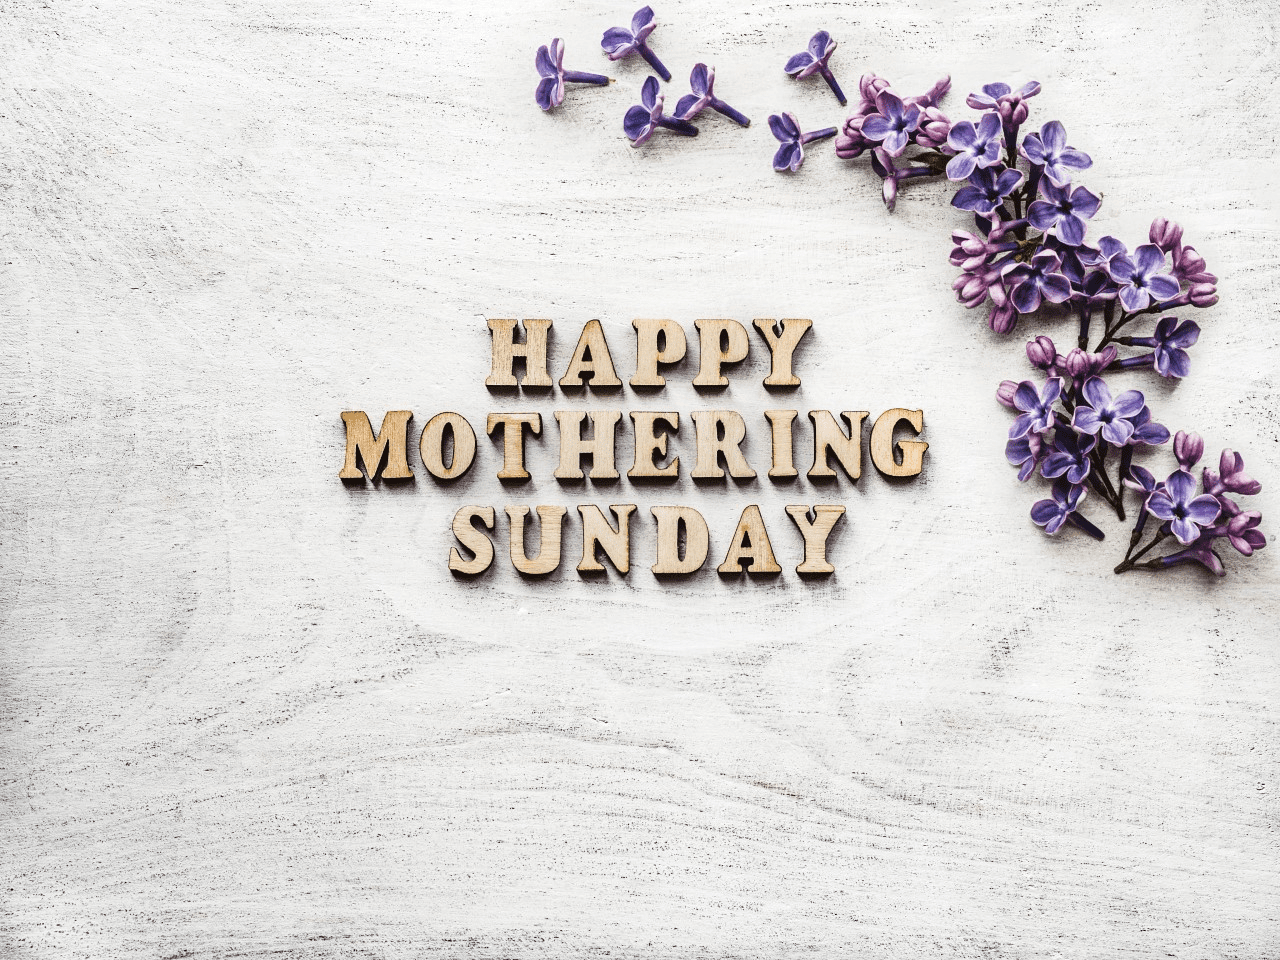 'happy mothering sunday' stock image